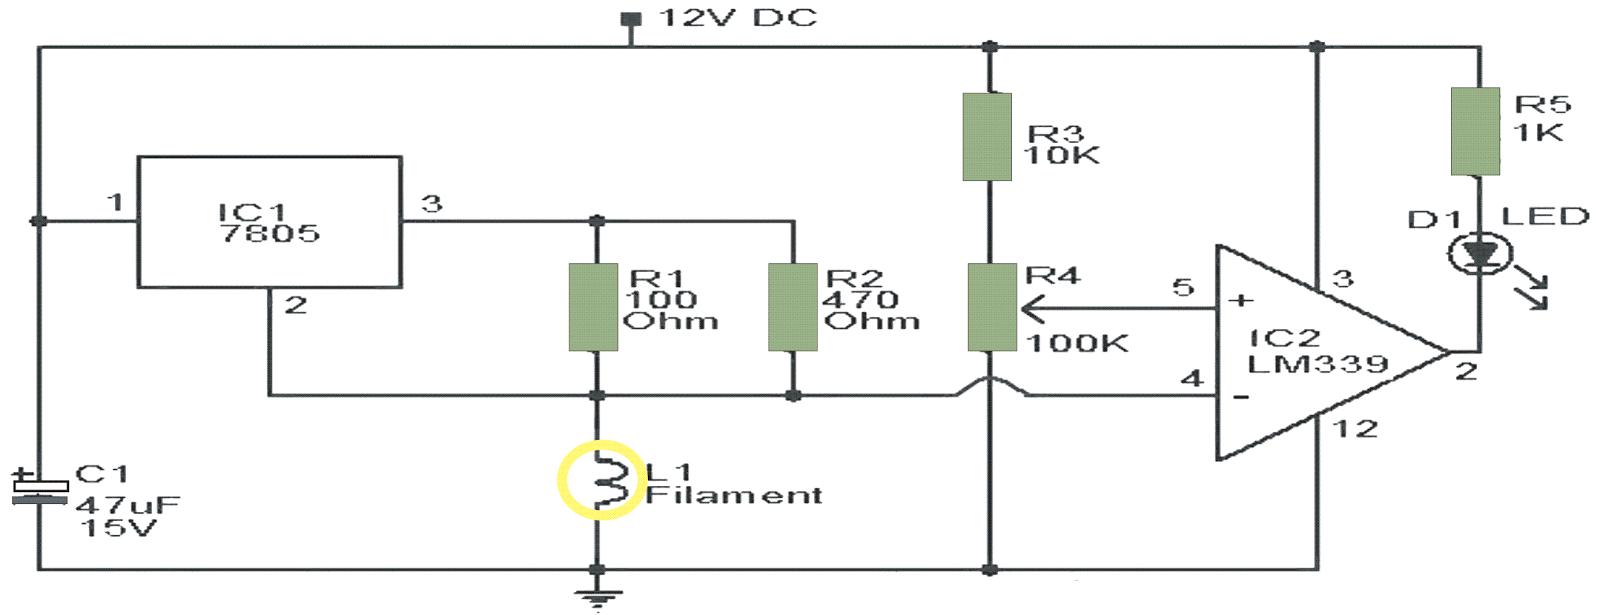 air flow detector circuit expert circuits rh expertcircuits blogspot com mass air flow sensor circuit diagram mass air flow sensor circuit diagram